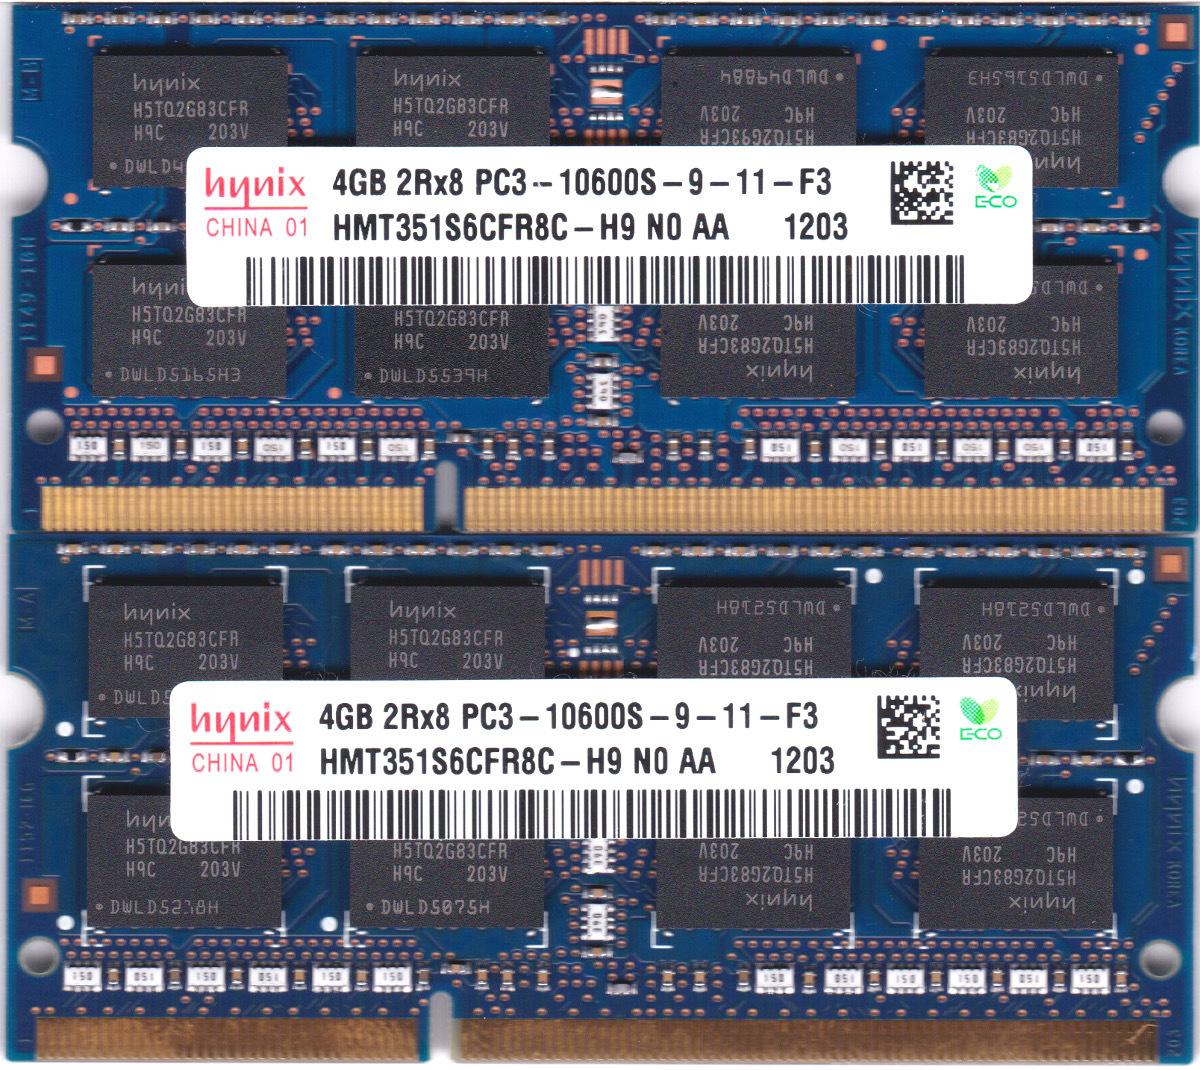 hynix PC3-10600S (DDR3-1333) 4GB x 2枚組み 合計8GB SO-DIMM 204pin ノートパソコン用メモリ 動作保証品